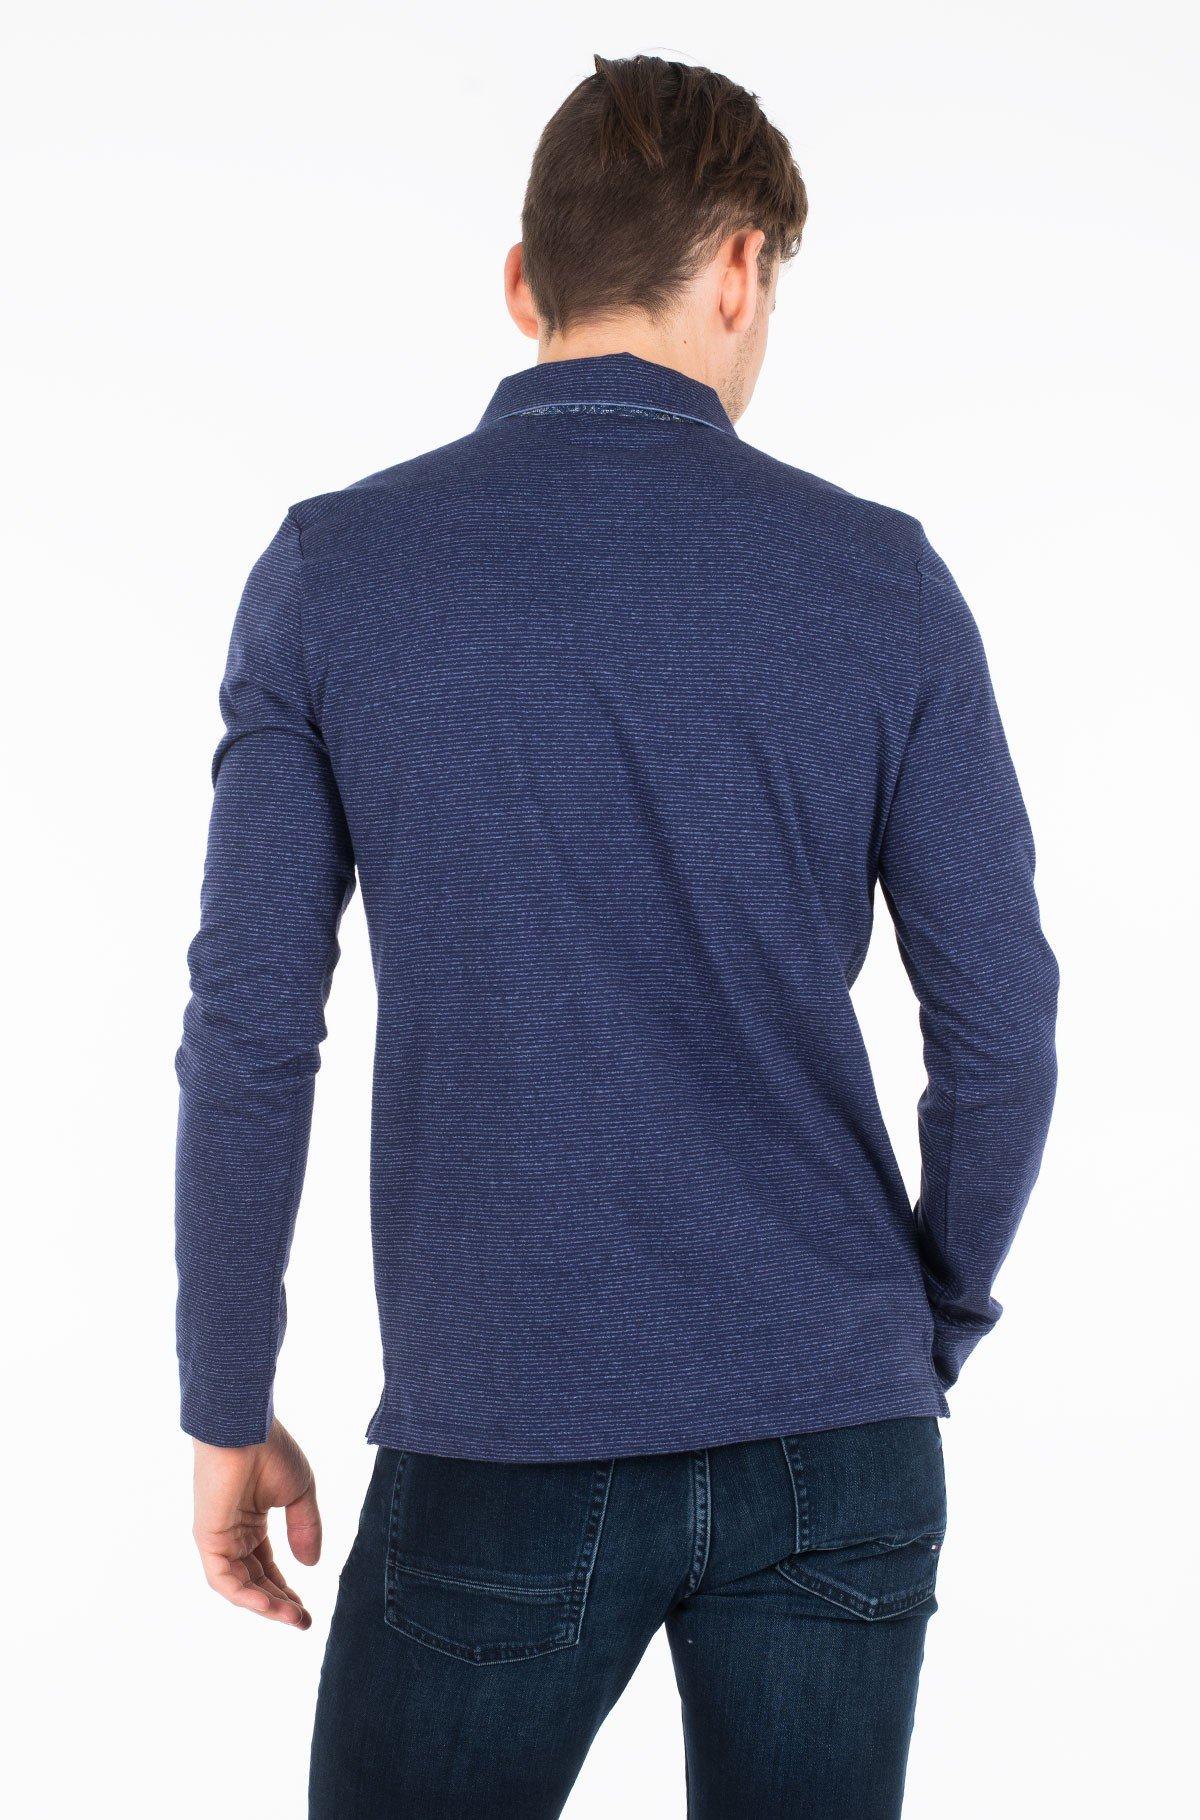 Polo marškinėliai ilgomis rankovėmis 53434-92307-full-2